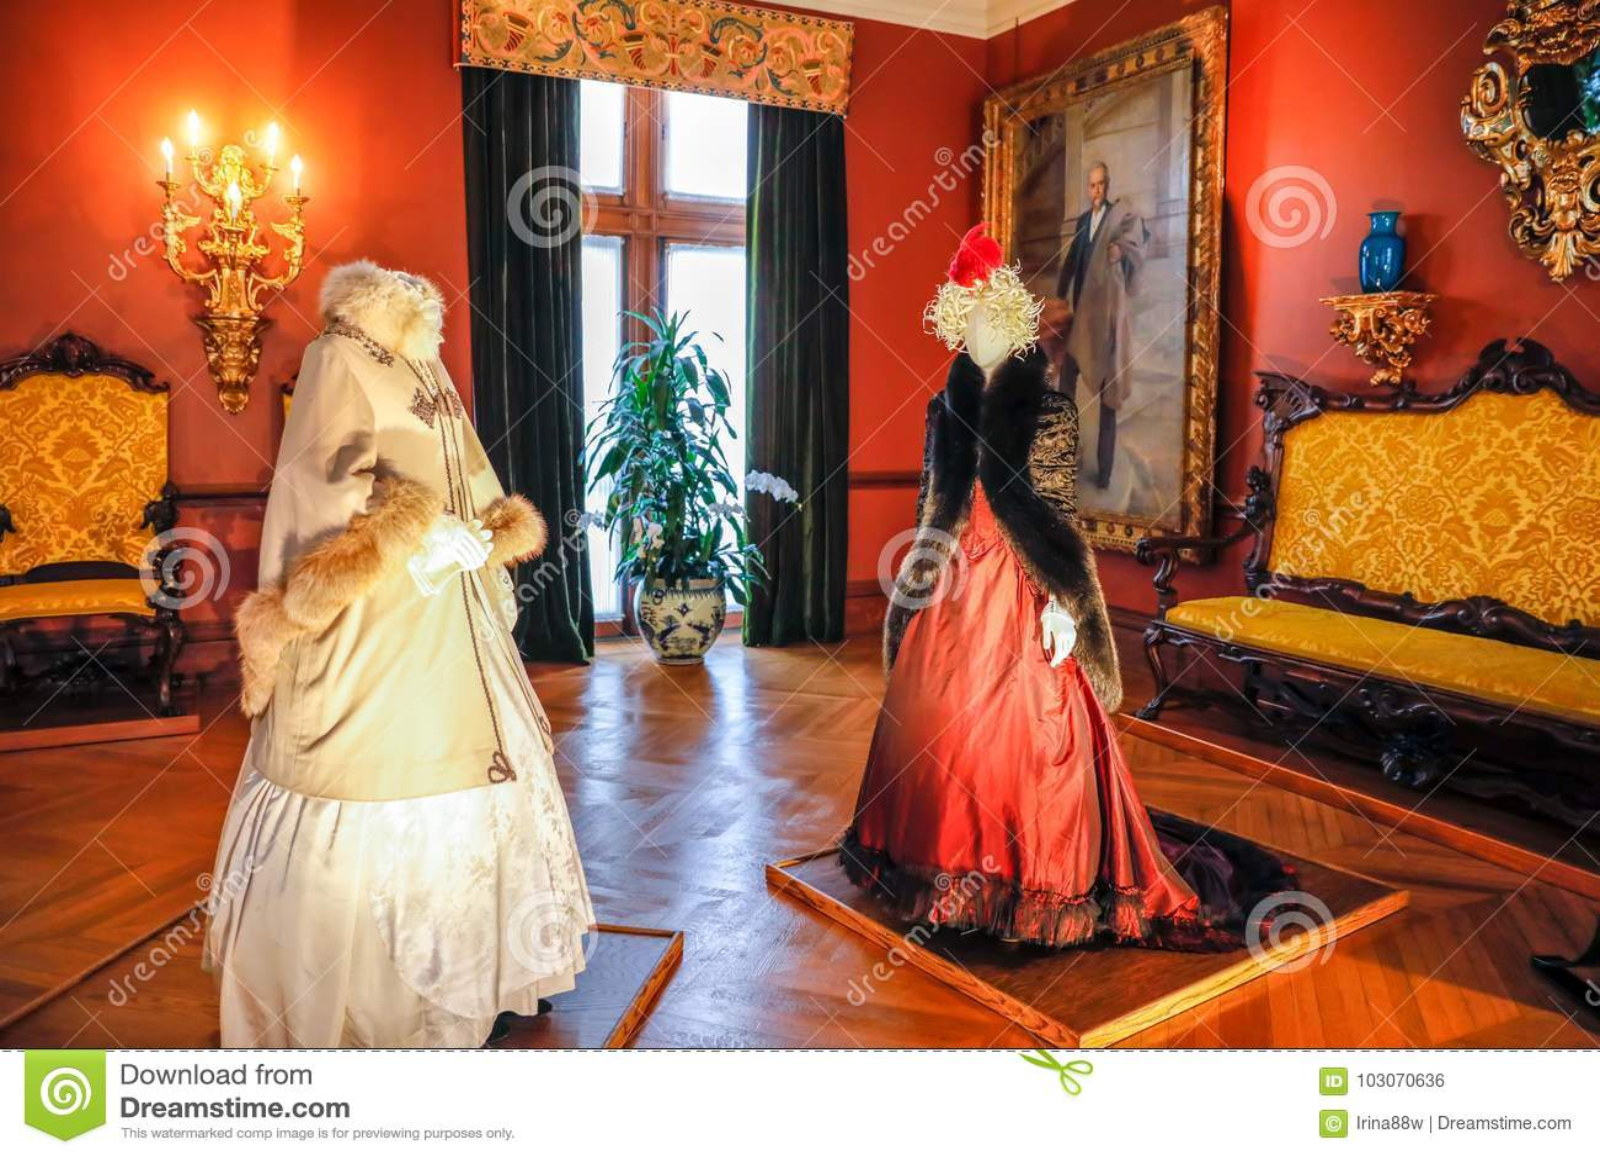 Asheville North Carolina March 4 2017 Biltmore S Costume Exhibition Designed For Drama Fashion From The Classics Editorial Photo Image Of Inside Landmark 103070636